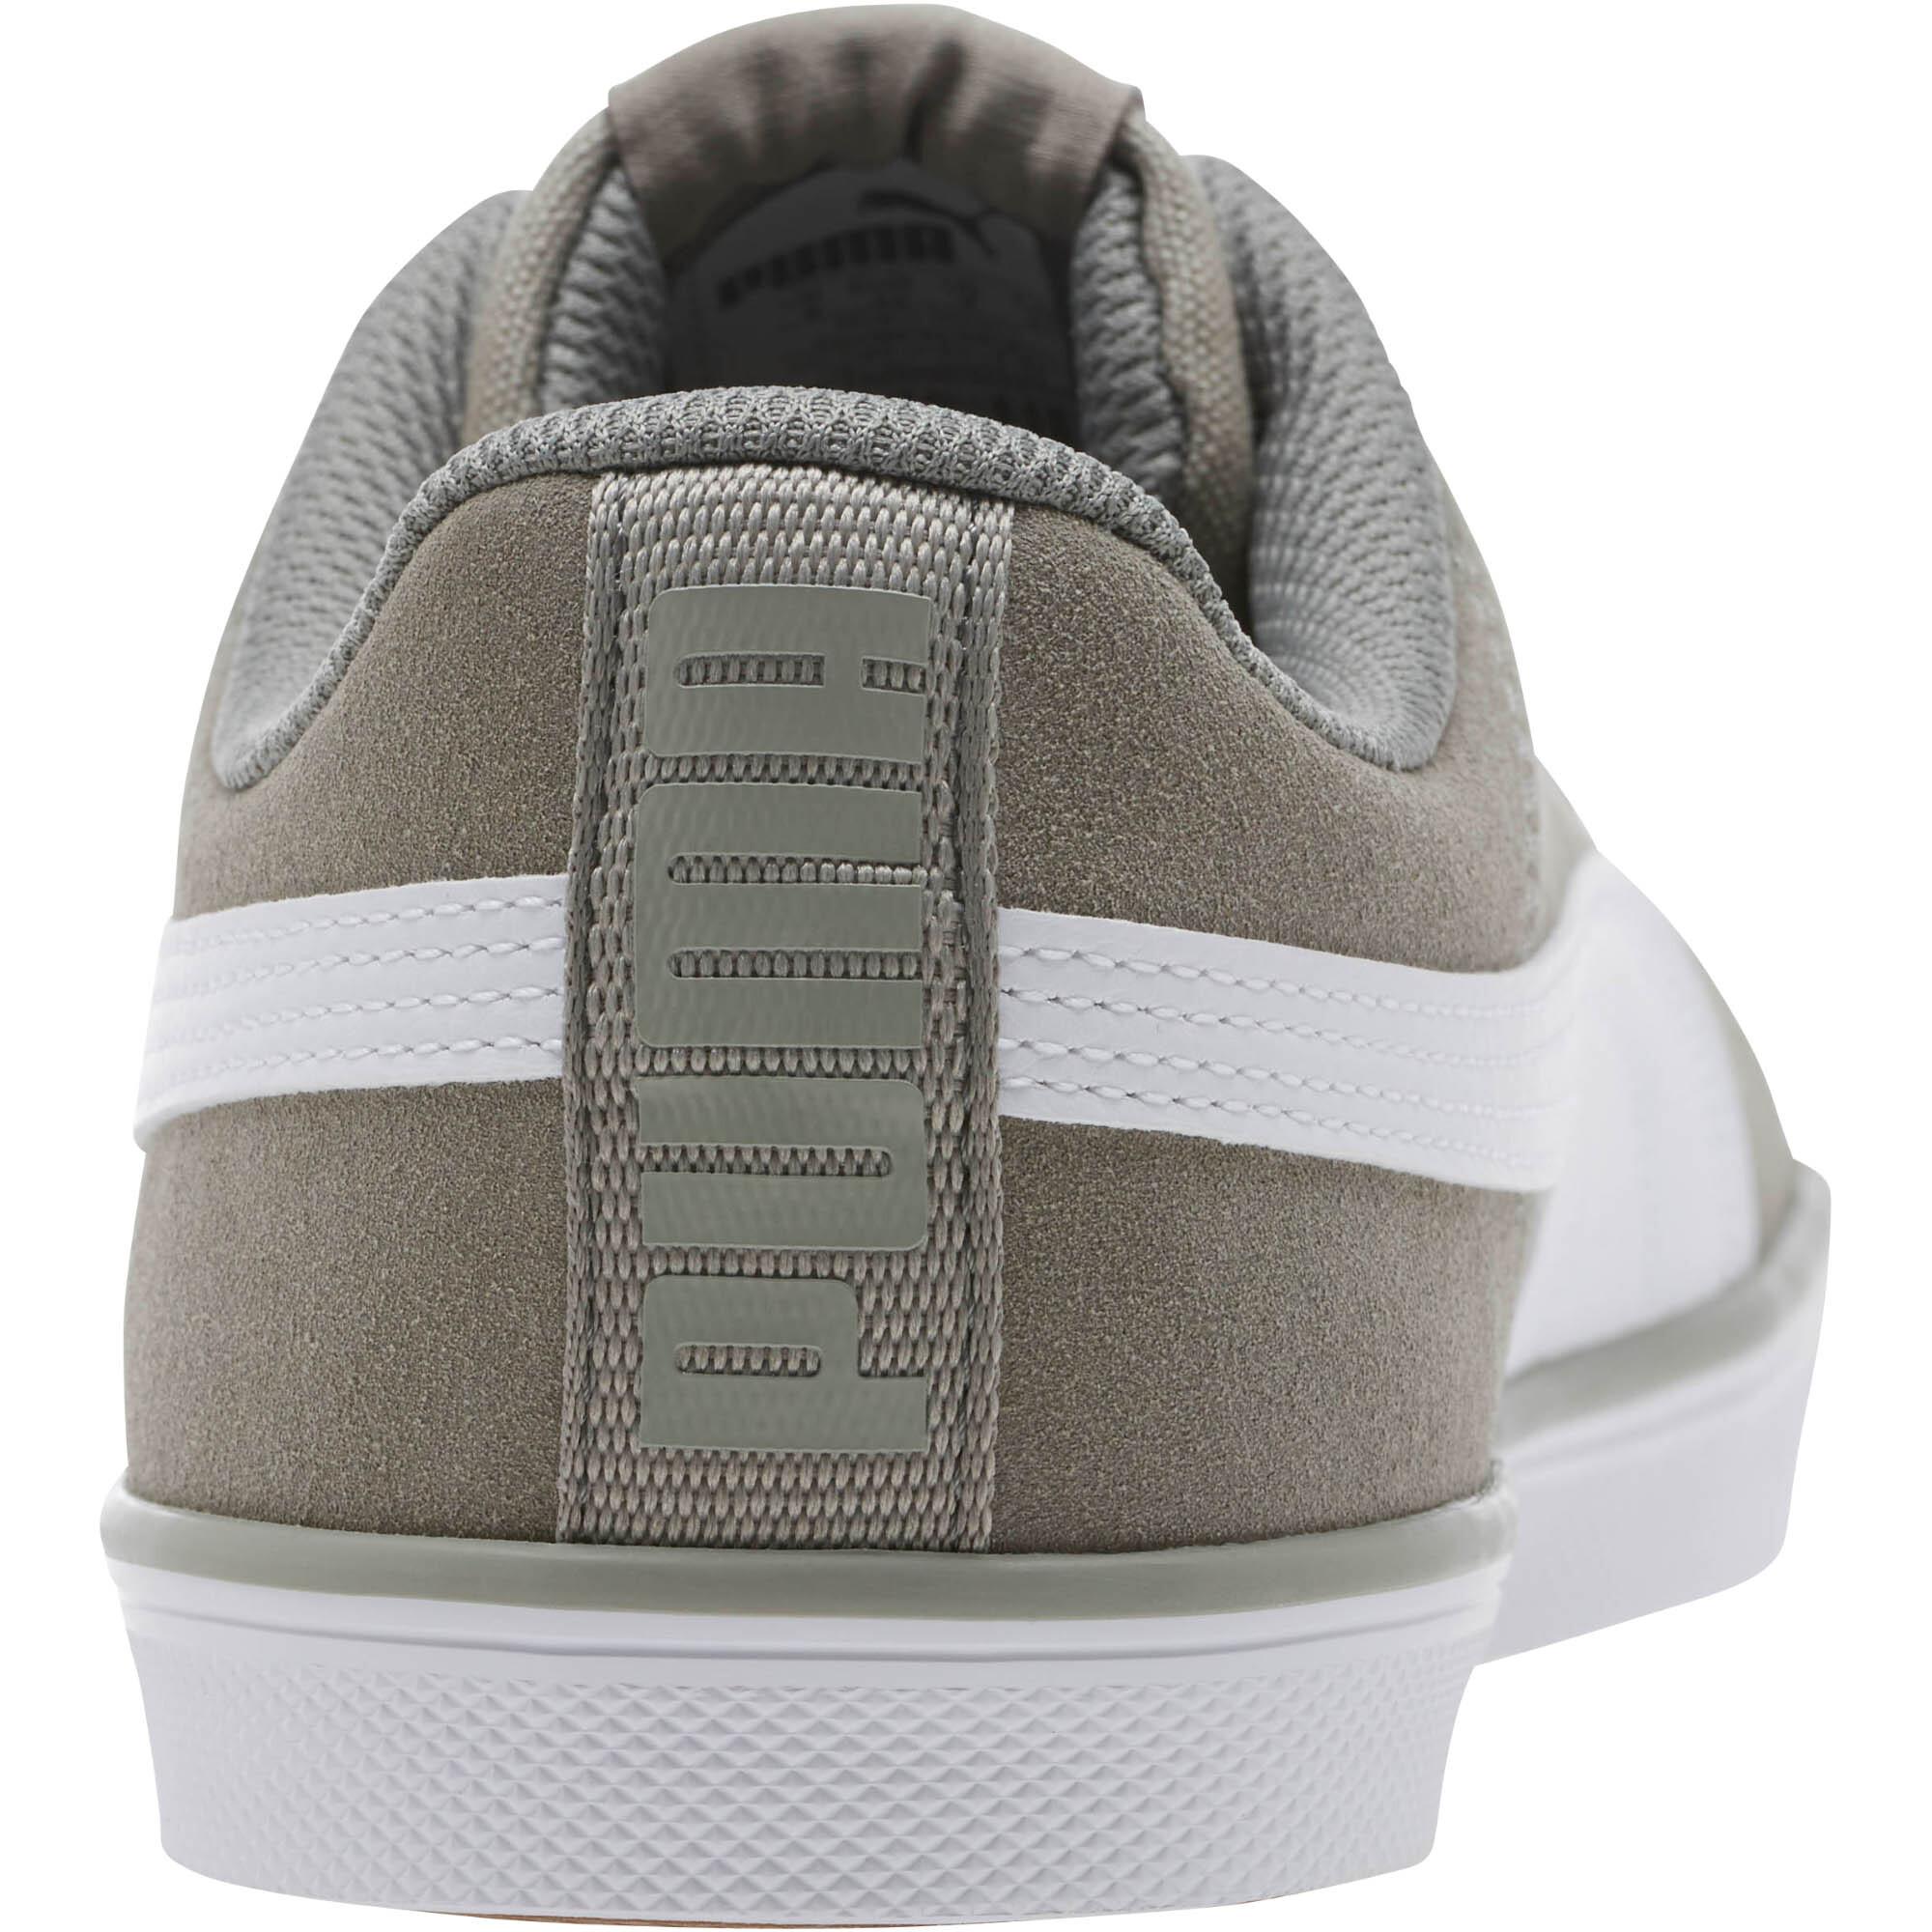 PUMA-Urban-Plus-Suede-Sneakers-Men-Shoe-Basics thumbnail 12